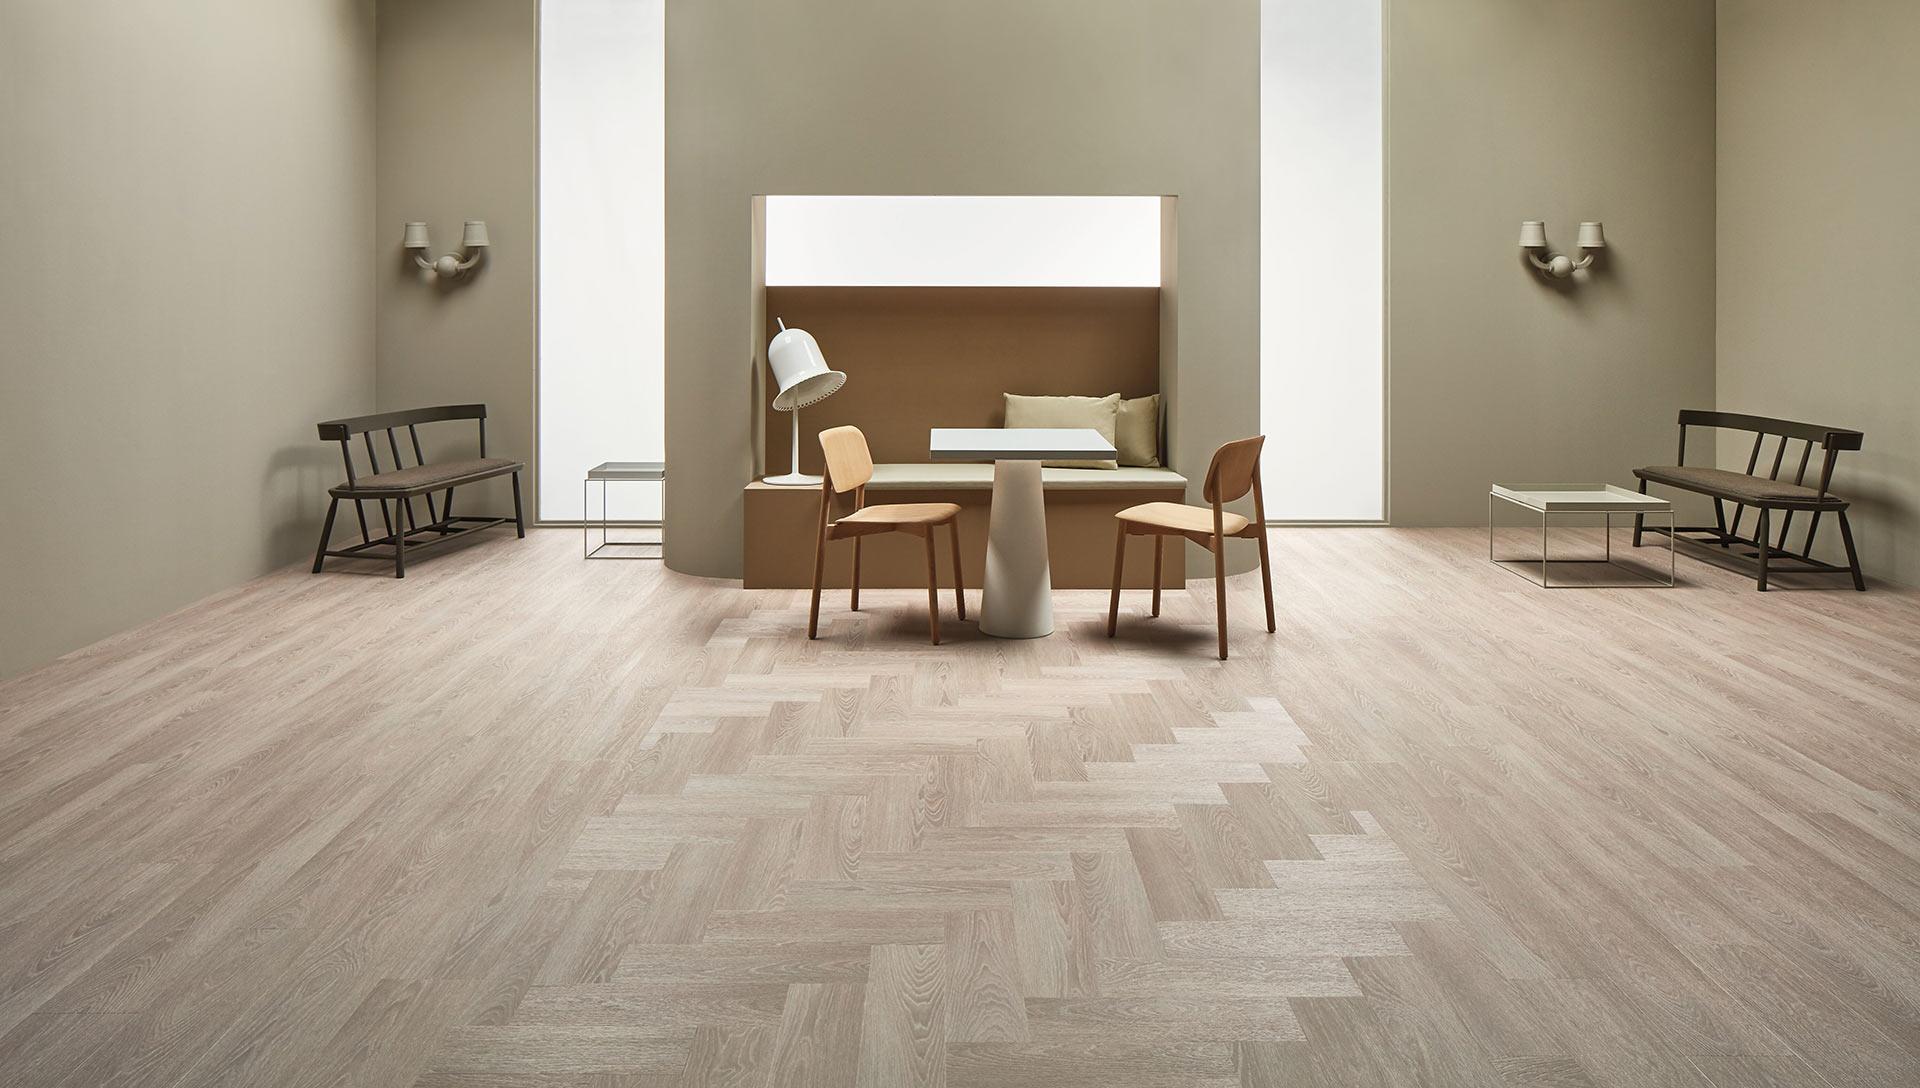 Vinylboden Bleached Timber – Rustikale Looks: Vinyl mit authentischer Holz Optik – Jetzt kostenloses Muster bestellen!